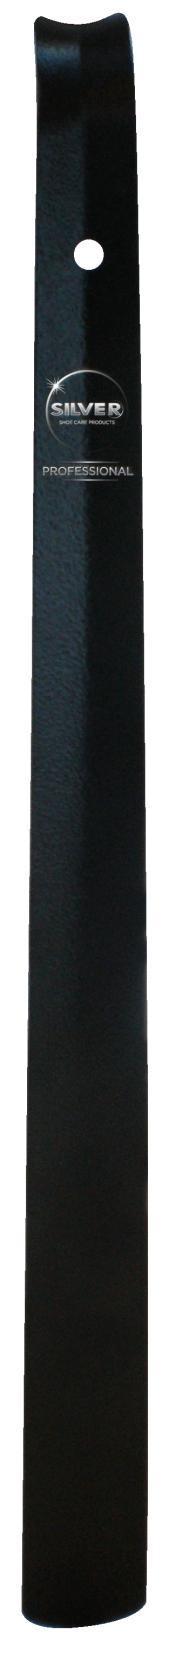 SILVER Professional Рожок для обуви